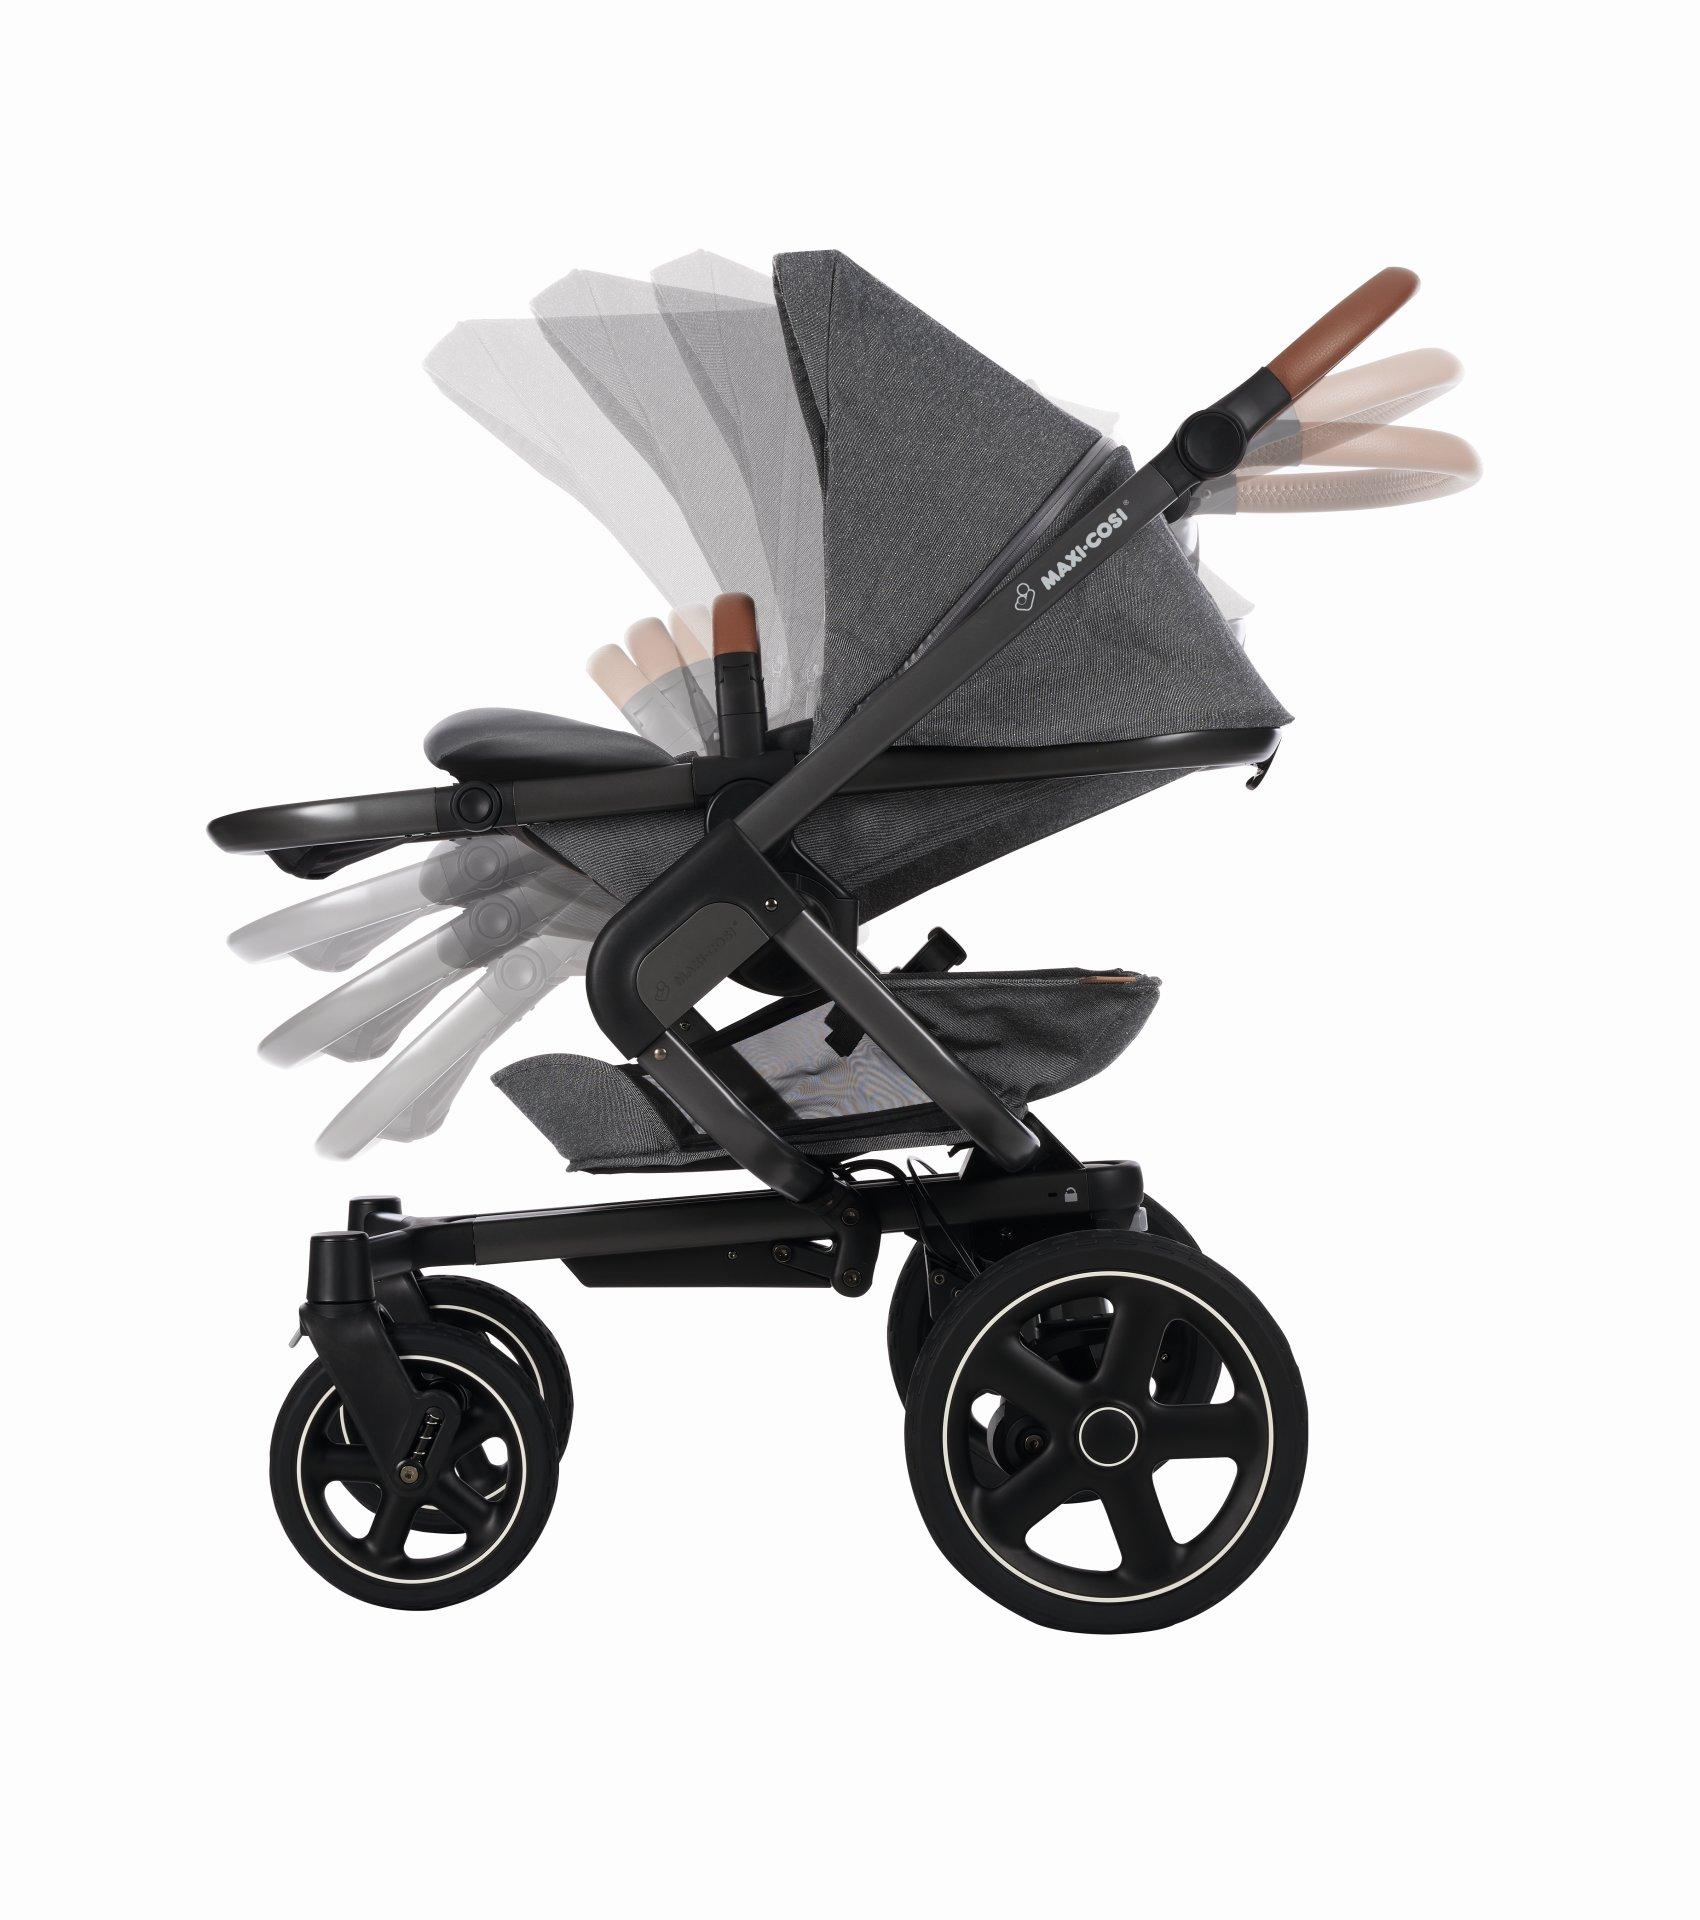 Maxi Cosi 4 Wheels Stroller Nova